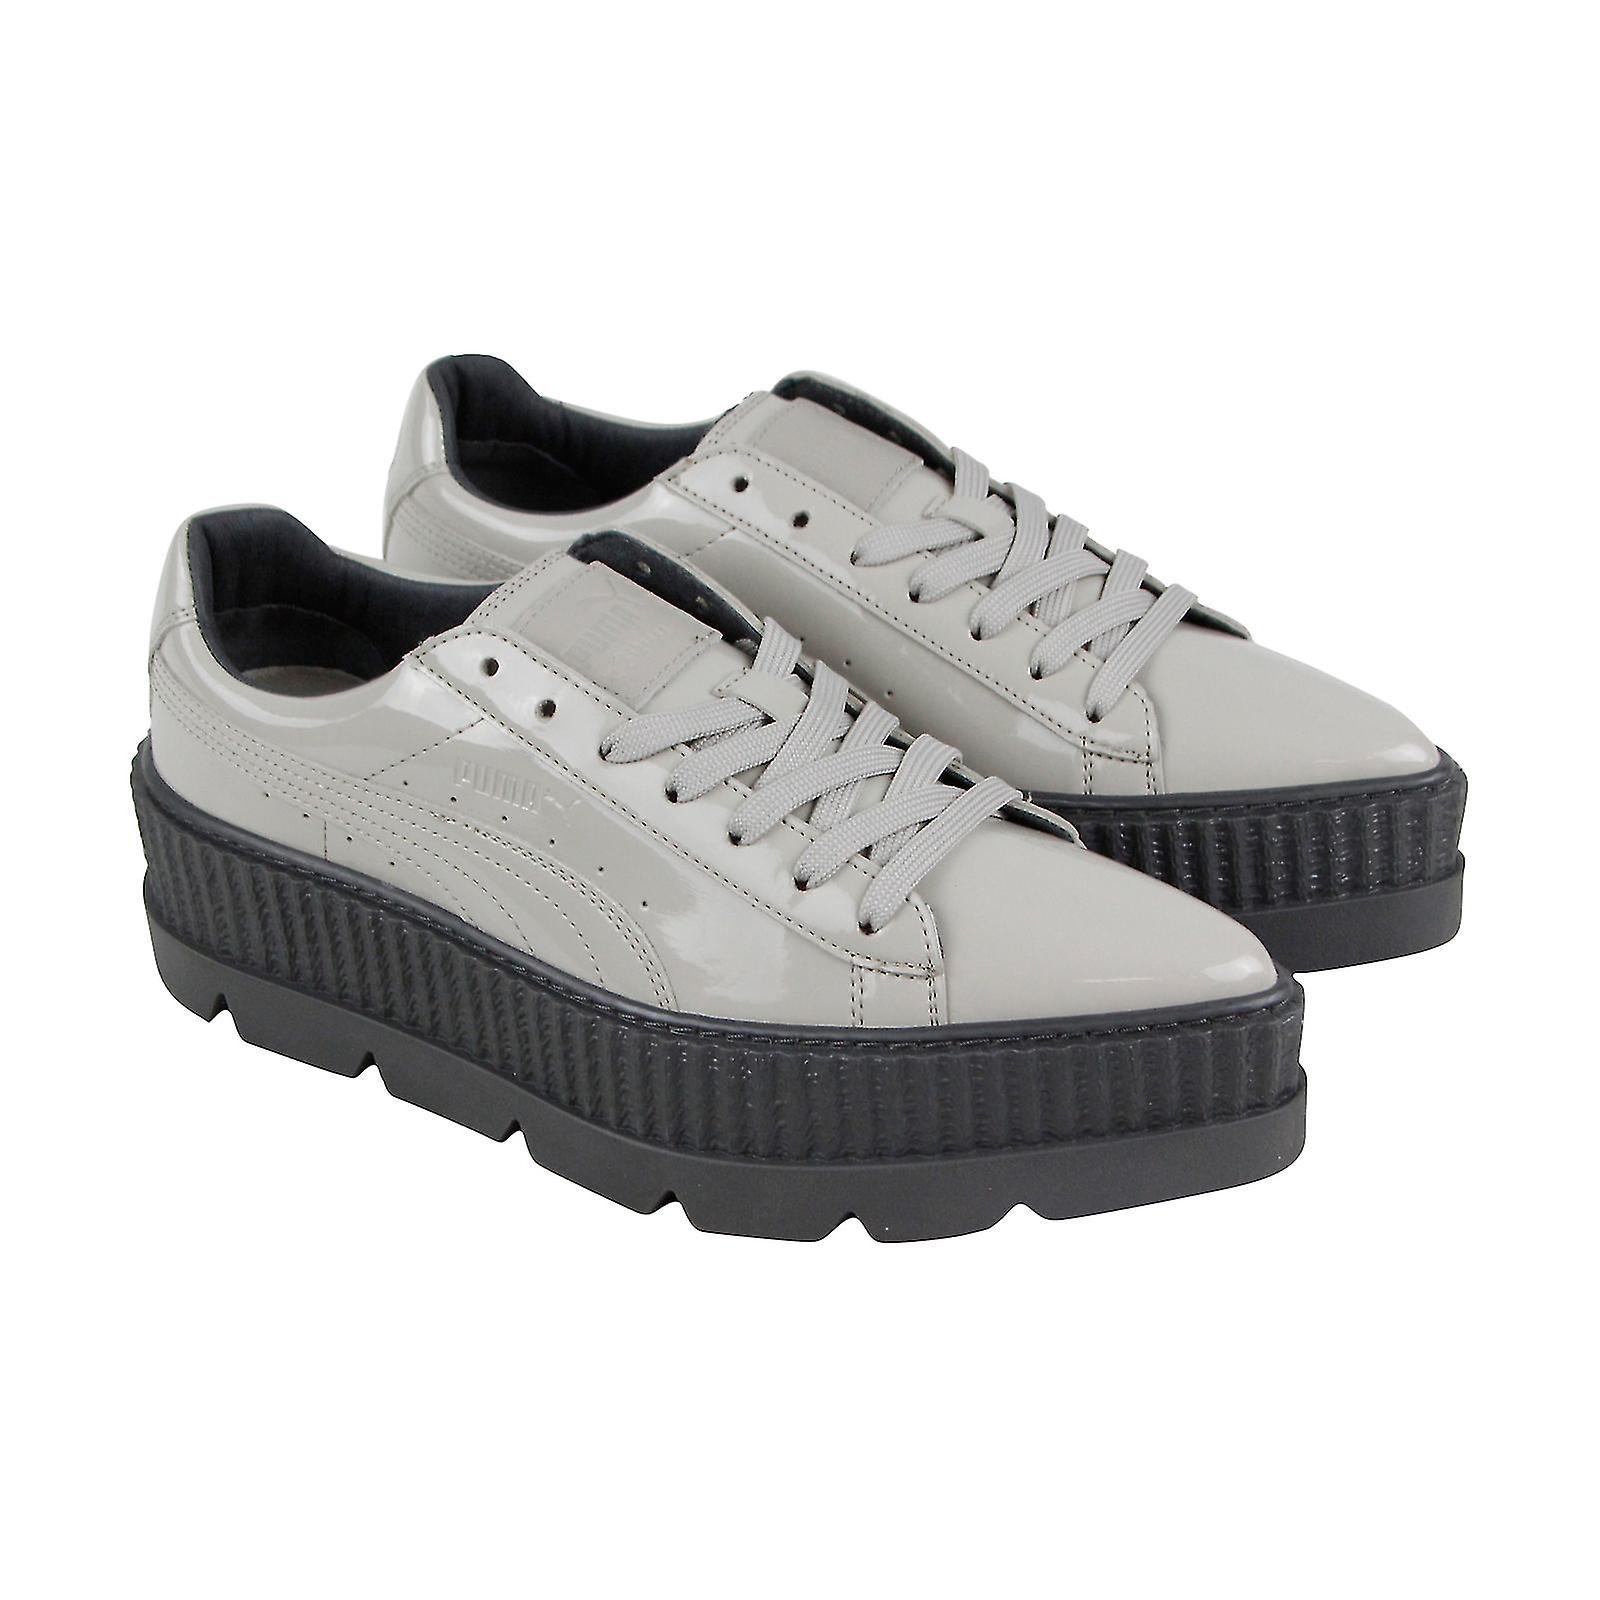 Puma spisse Creeper kvinner grå casual Lace up joggesko sko